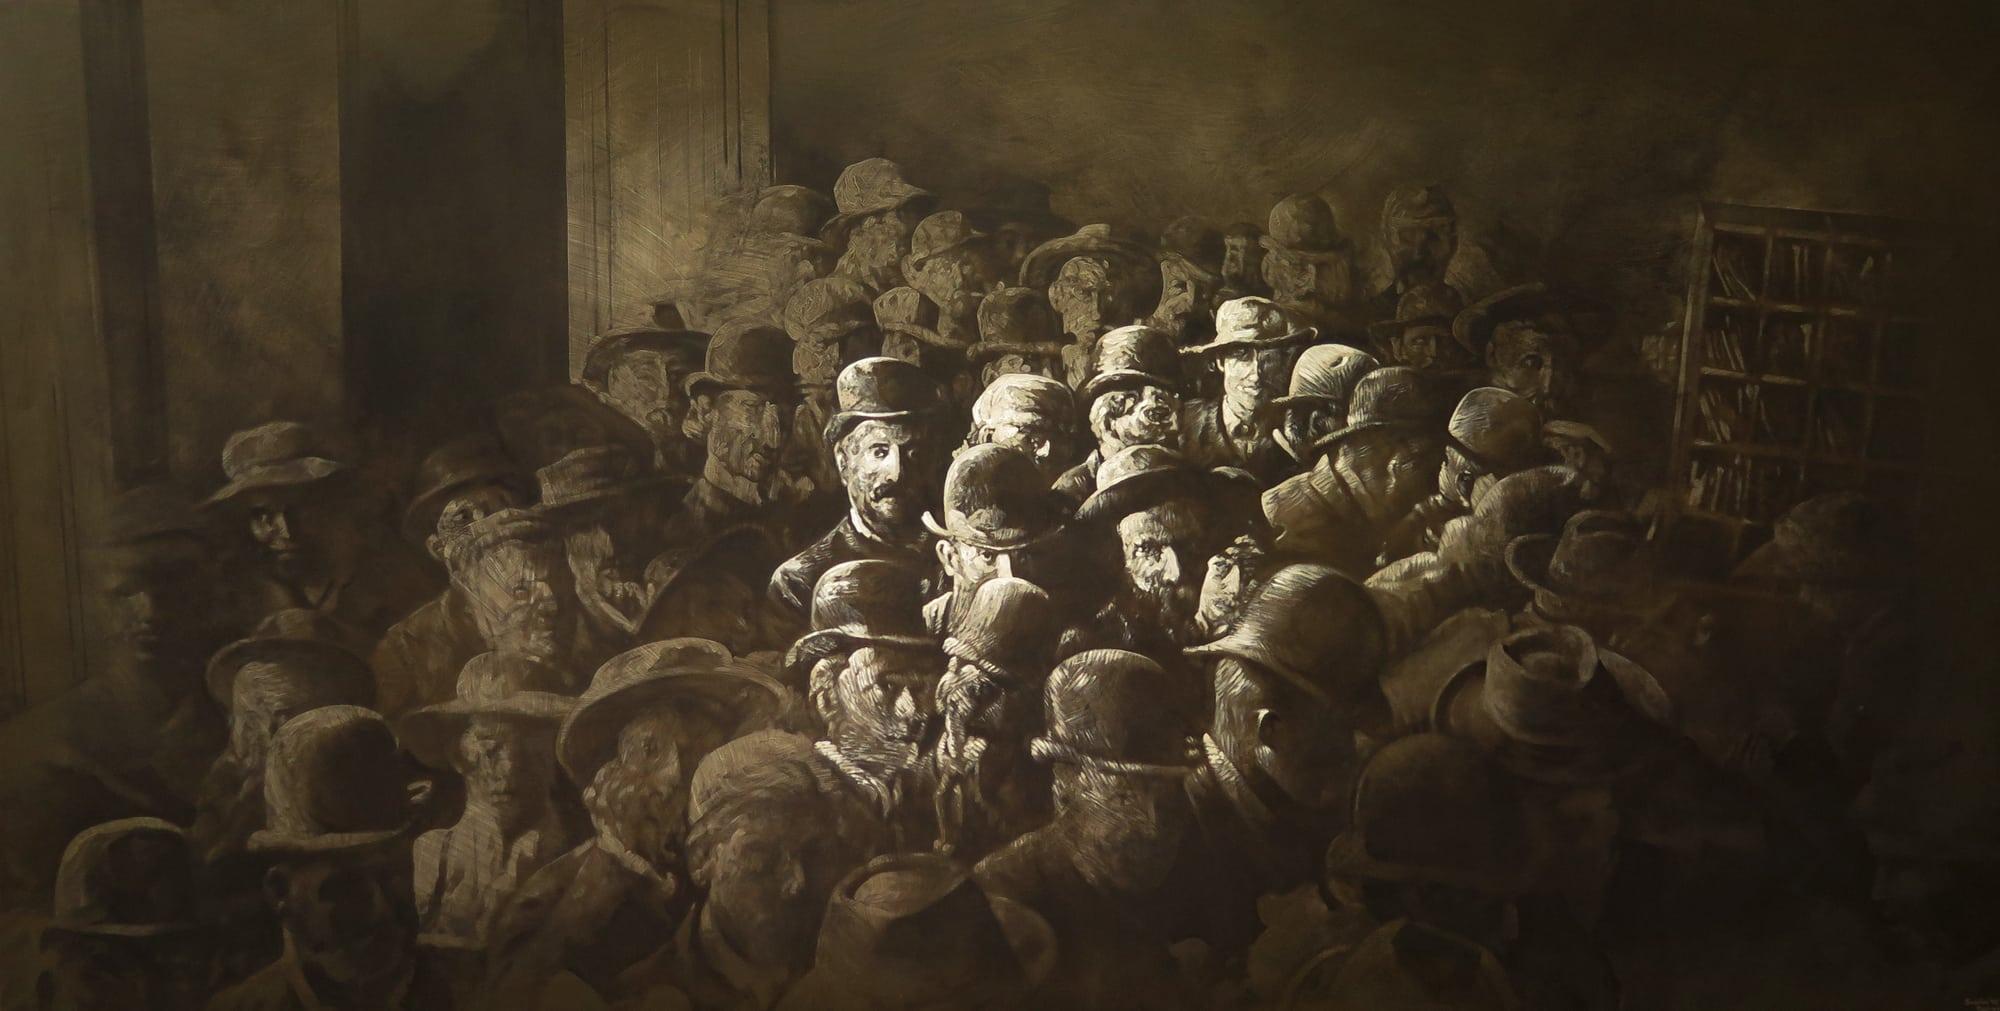 <span class=&#34;link fancybox-details-link&#34;><a href=&#34;/artists/73-sascha-%26-tashi-stylianou/works/3180-sascha-tashi-stylianou-joburg-transatlantic-2015/&#34;>View Detail Page</a></span><div class=&#34;artist&#34;><strong>Sascha & Tashi Stylianou</strong></div> <div class=&#34;title&#34;><em>Joburg Transatlantic</em>, 2015</div> <div class=&#34;medium&#34;>Oils & Acrylic Spray On Reclaimed Board & Roof Struts </div> <div class=&#34;dimensions&#34;>184cm x 361cm x 5.5cm</div><div class=&#34;price&#34;>R50,000.00</div>